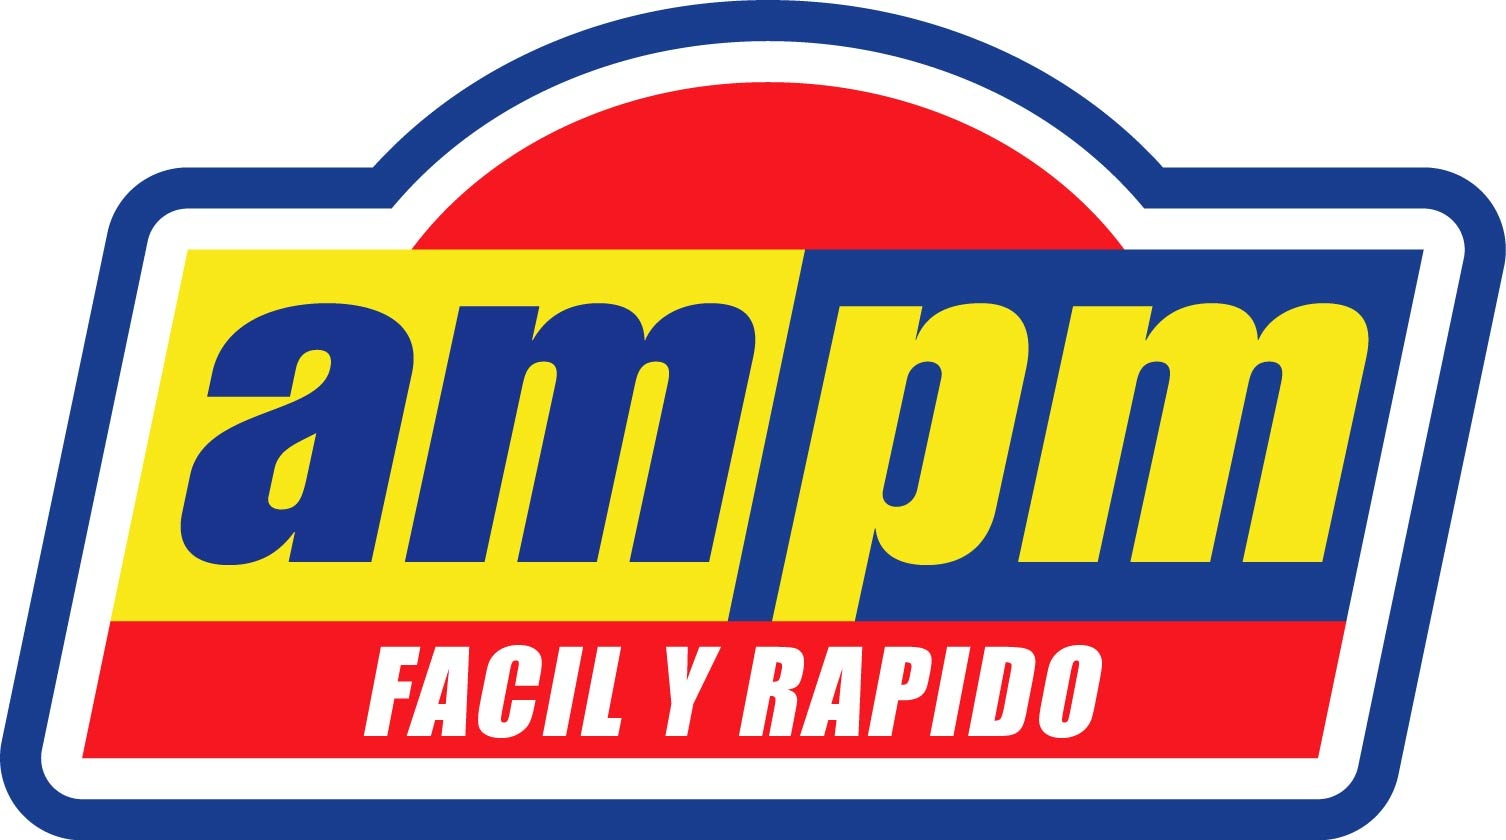 am pm supermarkets grow in costa rica centralamericadata the rh centralamericadata com ampm logistics brisbane ca am pm mascot toombs